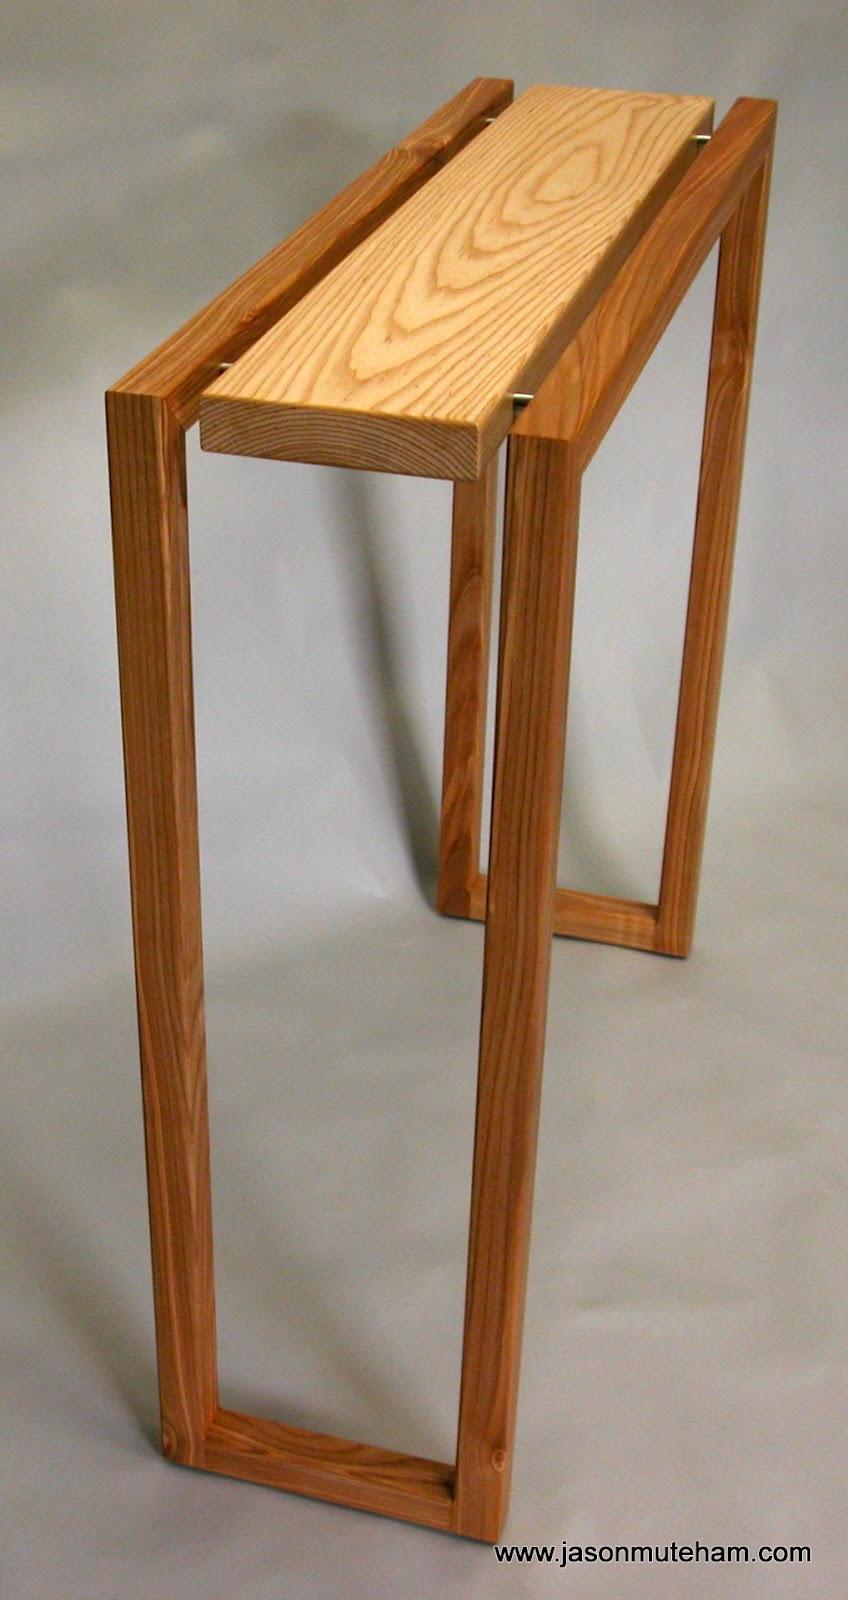 Jason muteham furniture designer maker hall table design for Furniture design for hall